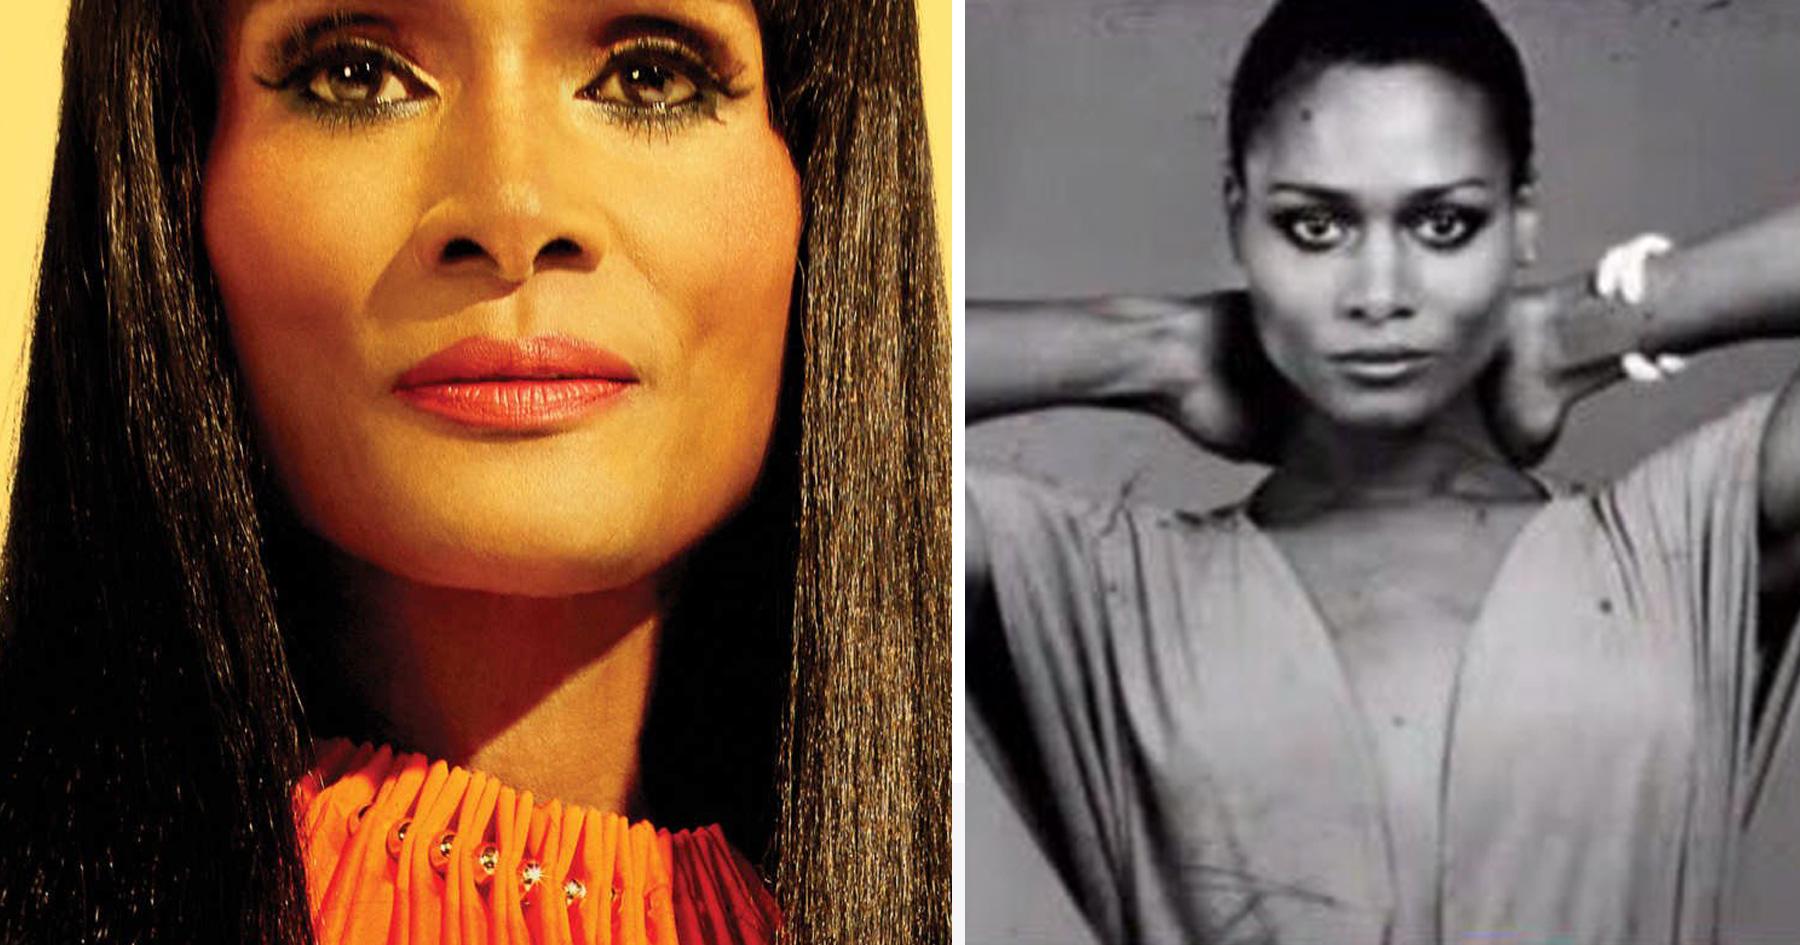 Jocelyn Oxlade (b. 1984),Mary Carey Adult pics Ryza Cenon (b. 1987),Stephanie Sheh